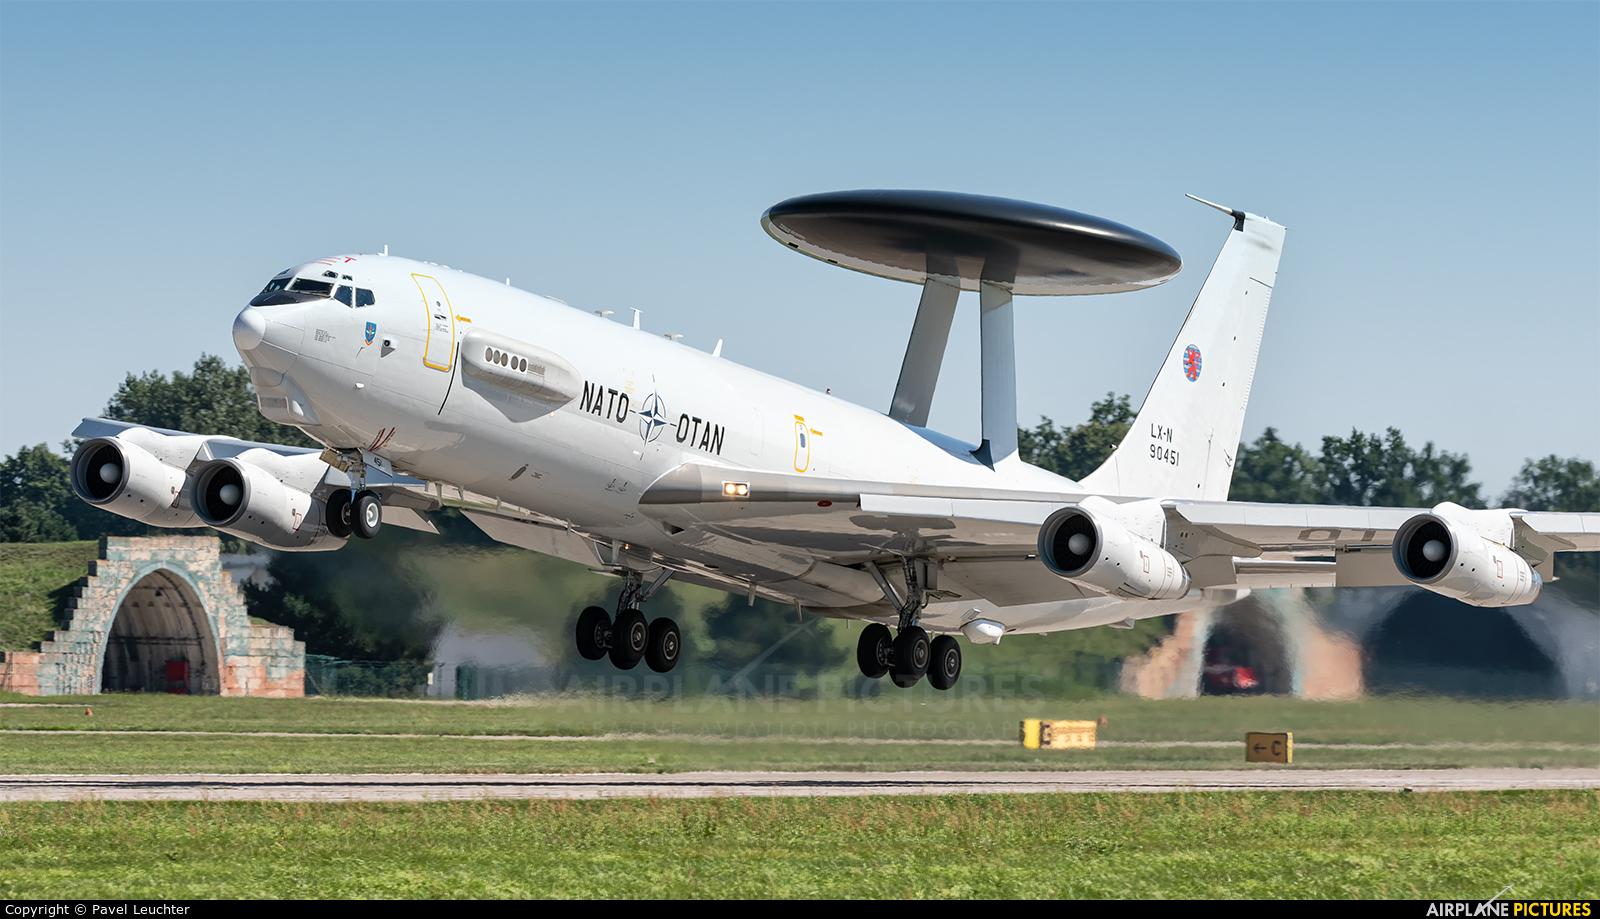 NATO LX-N90451 aircraft at Pardubice